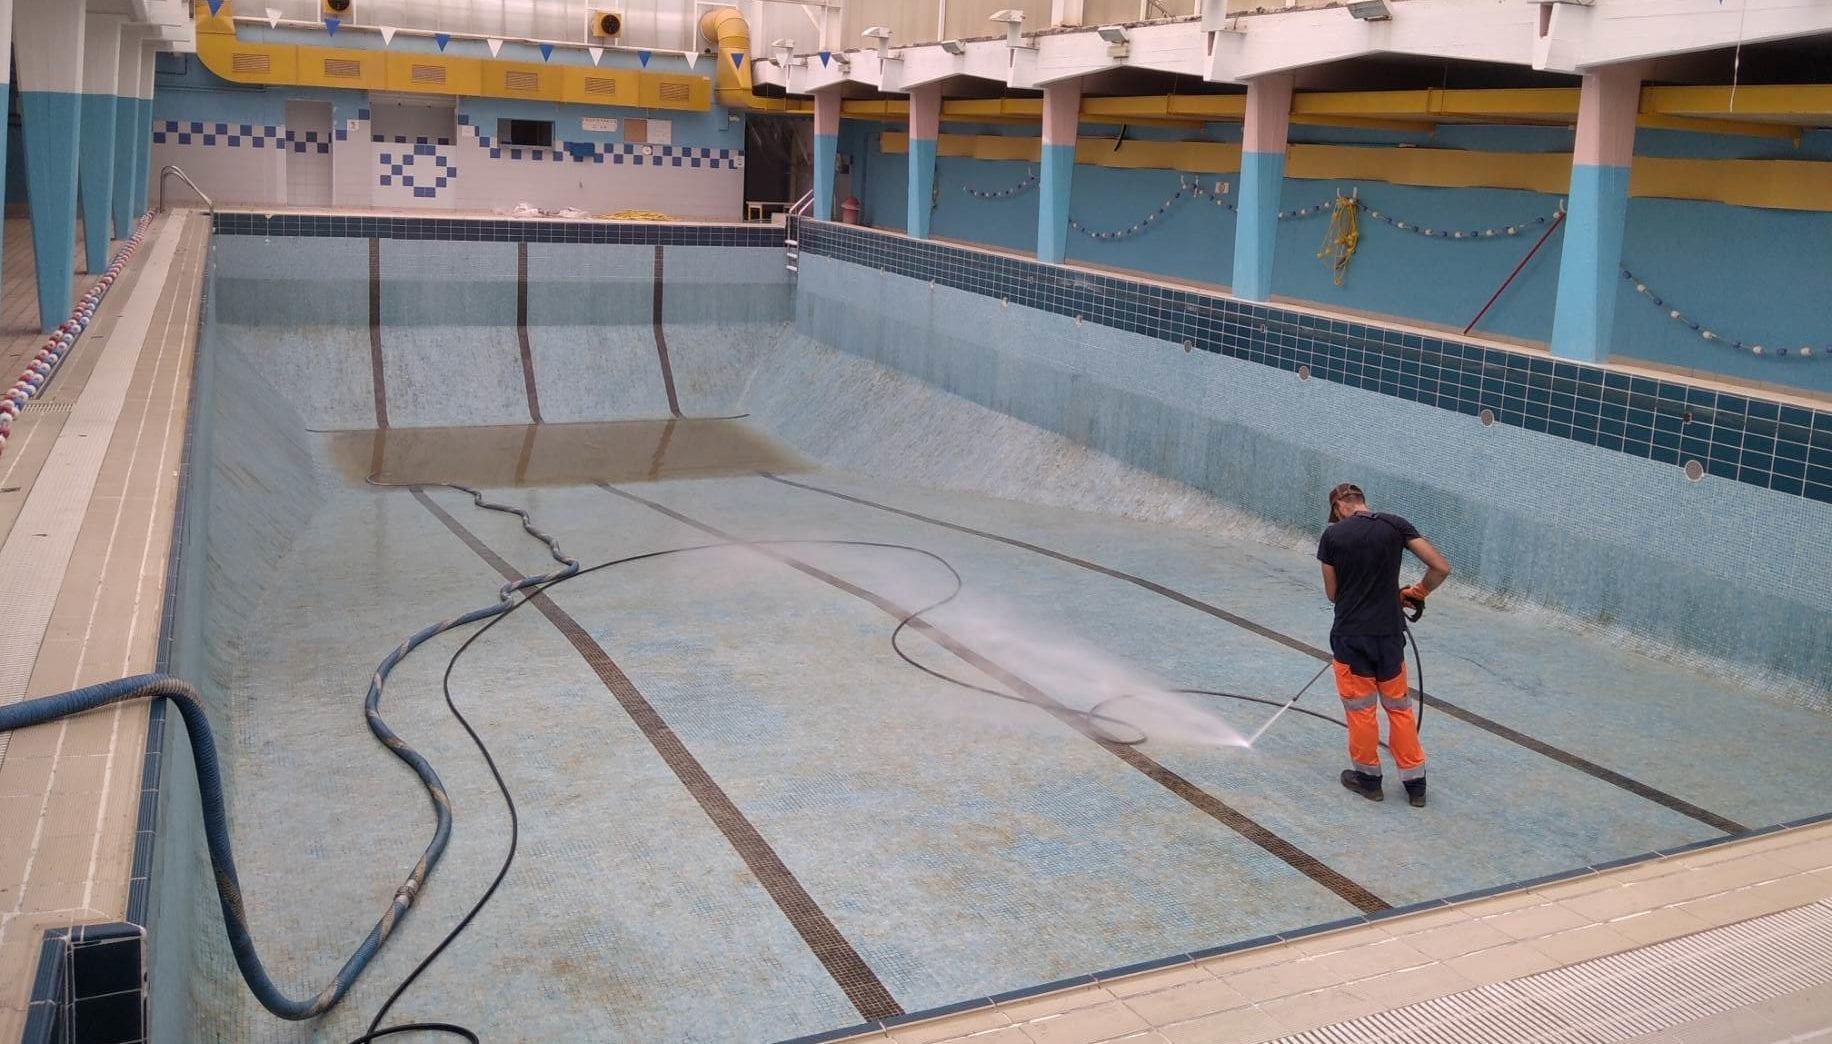 Pompage nettoyage piscine